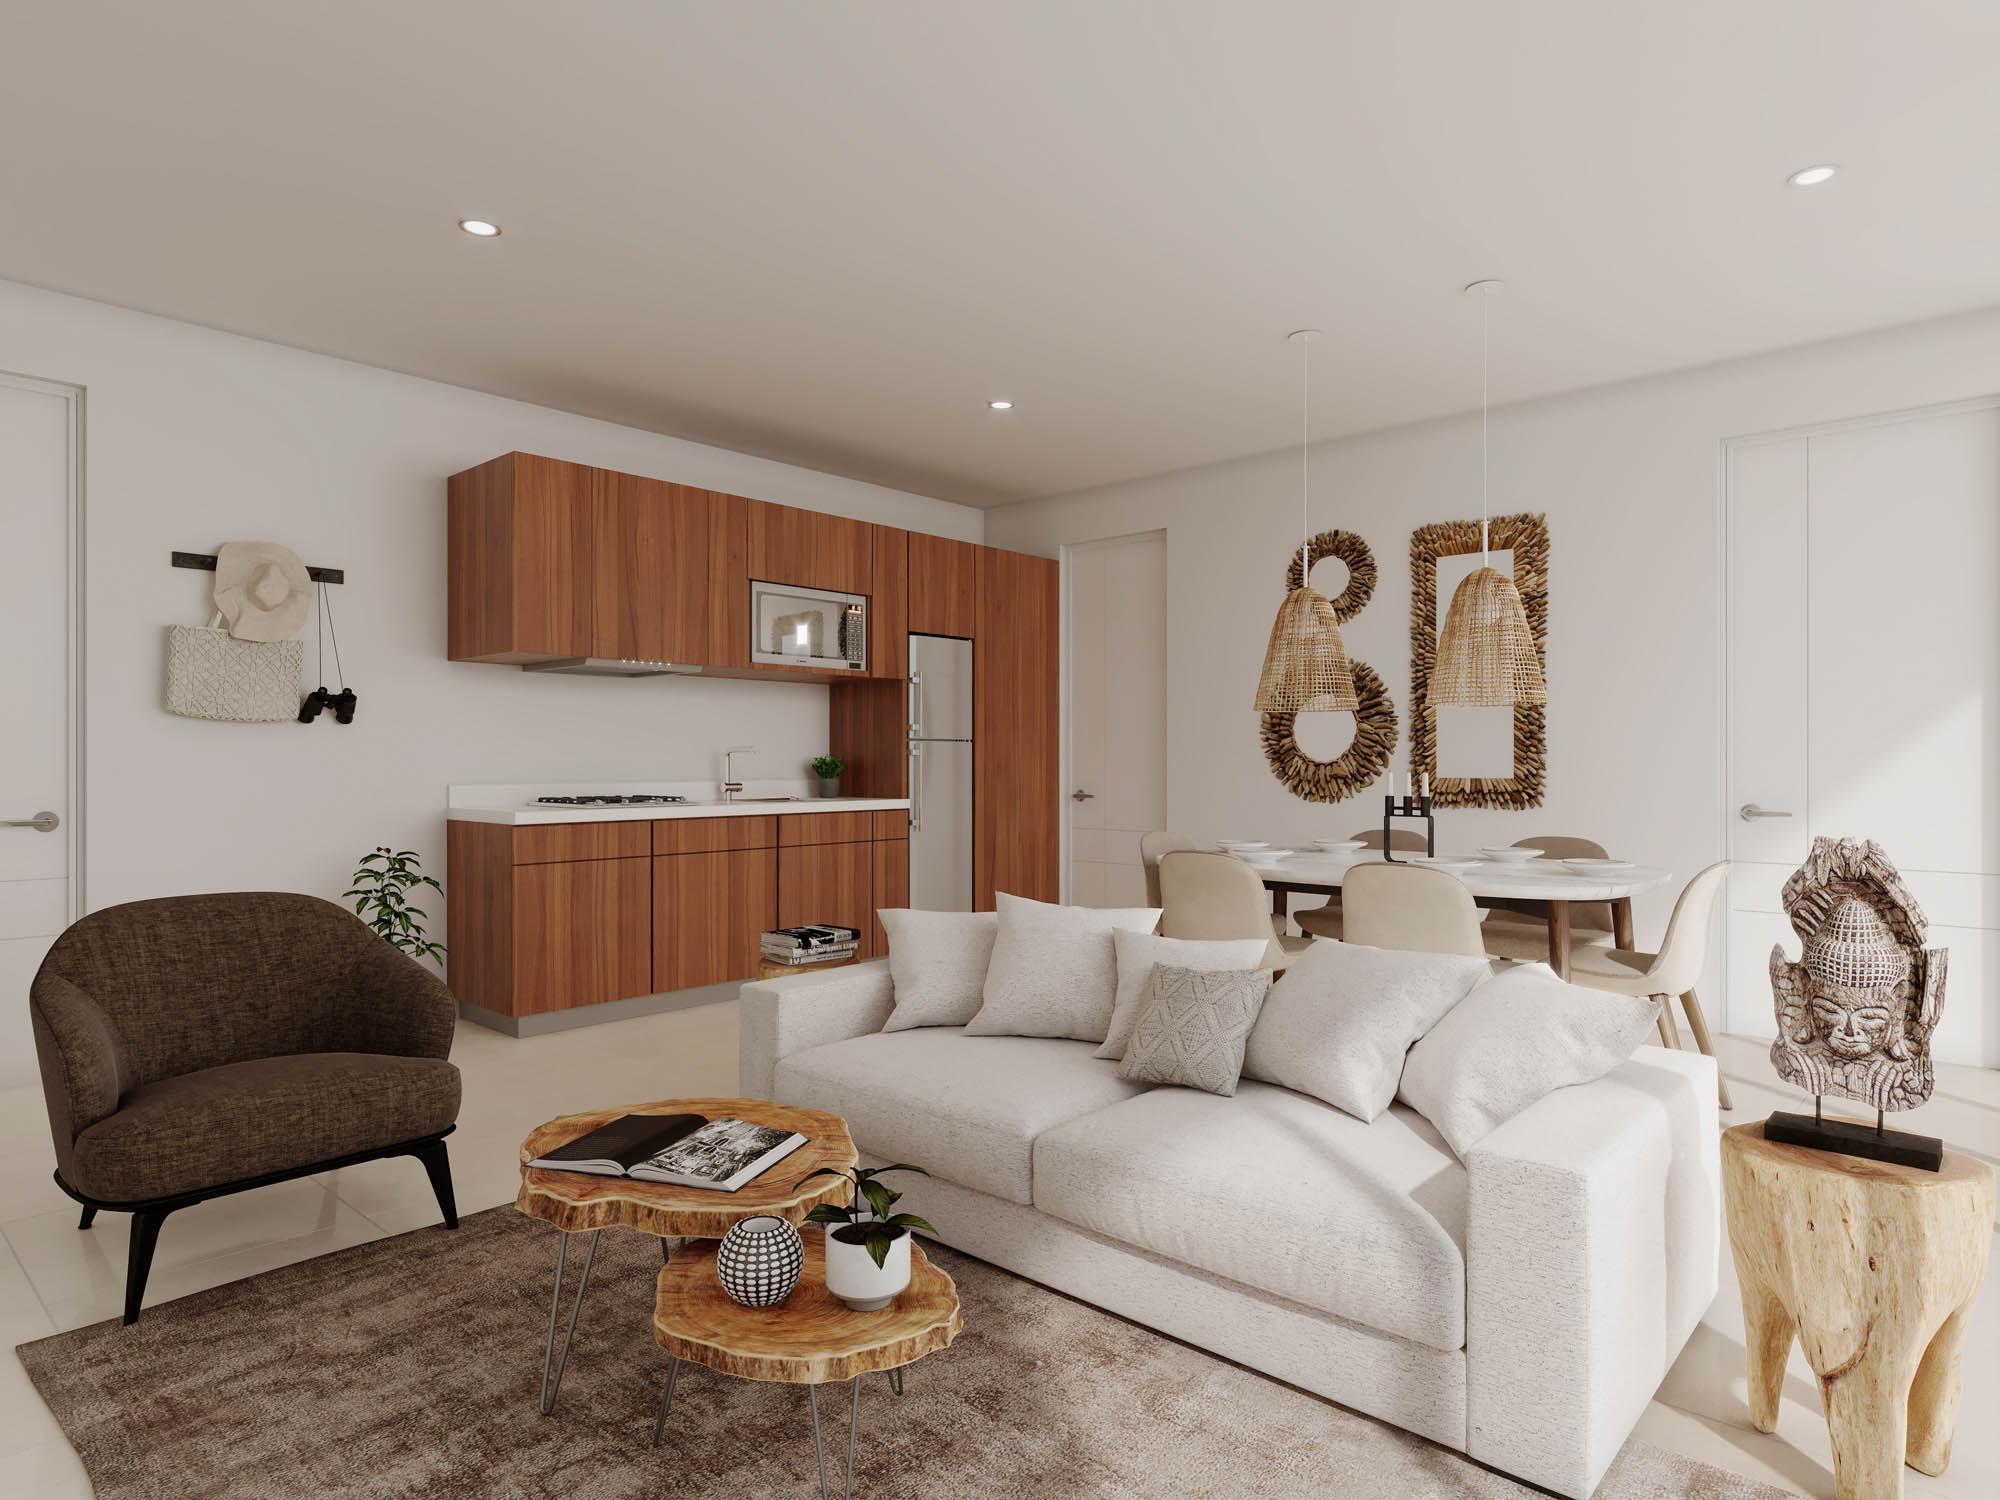 1 bedroom condo for sale near the beach